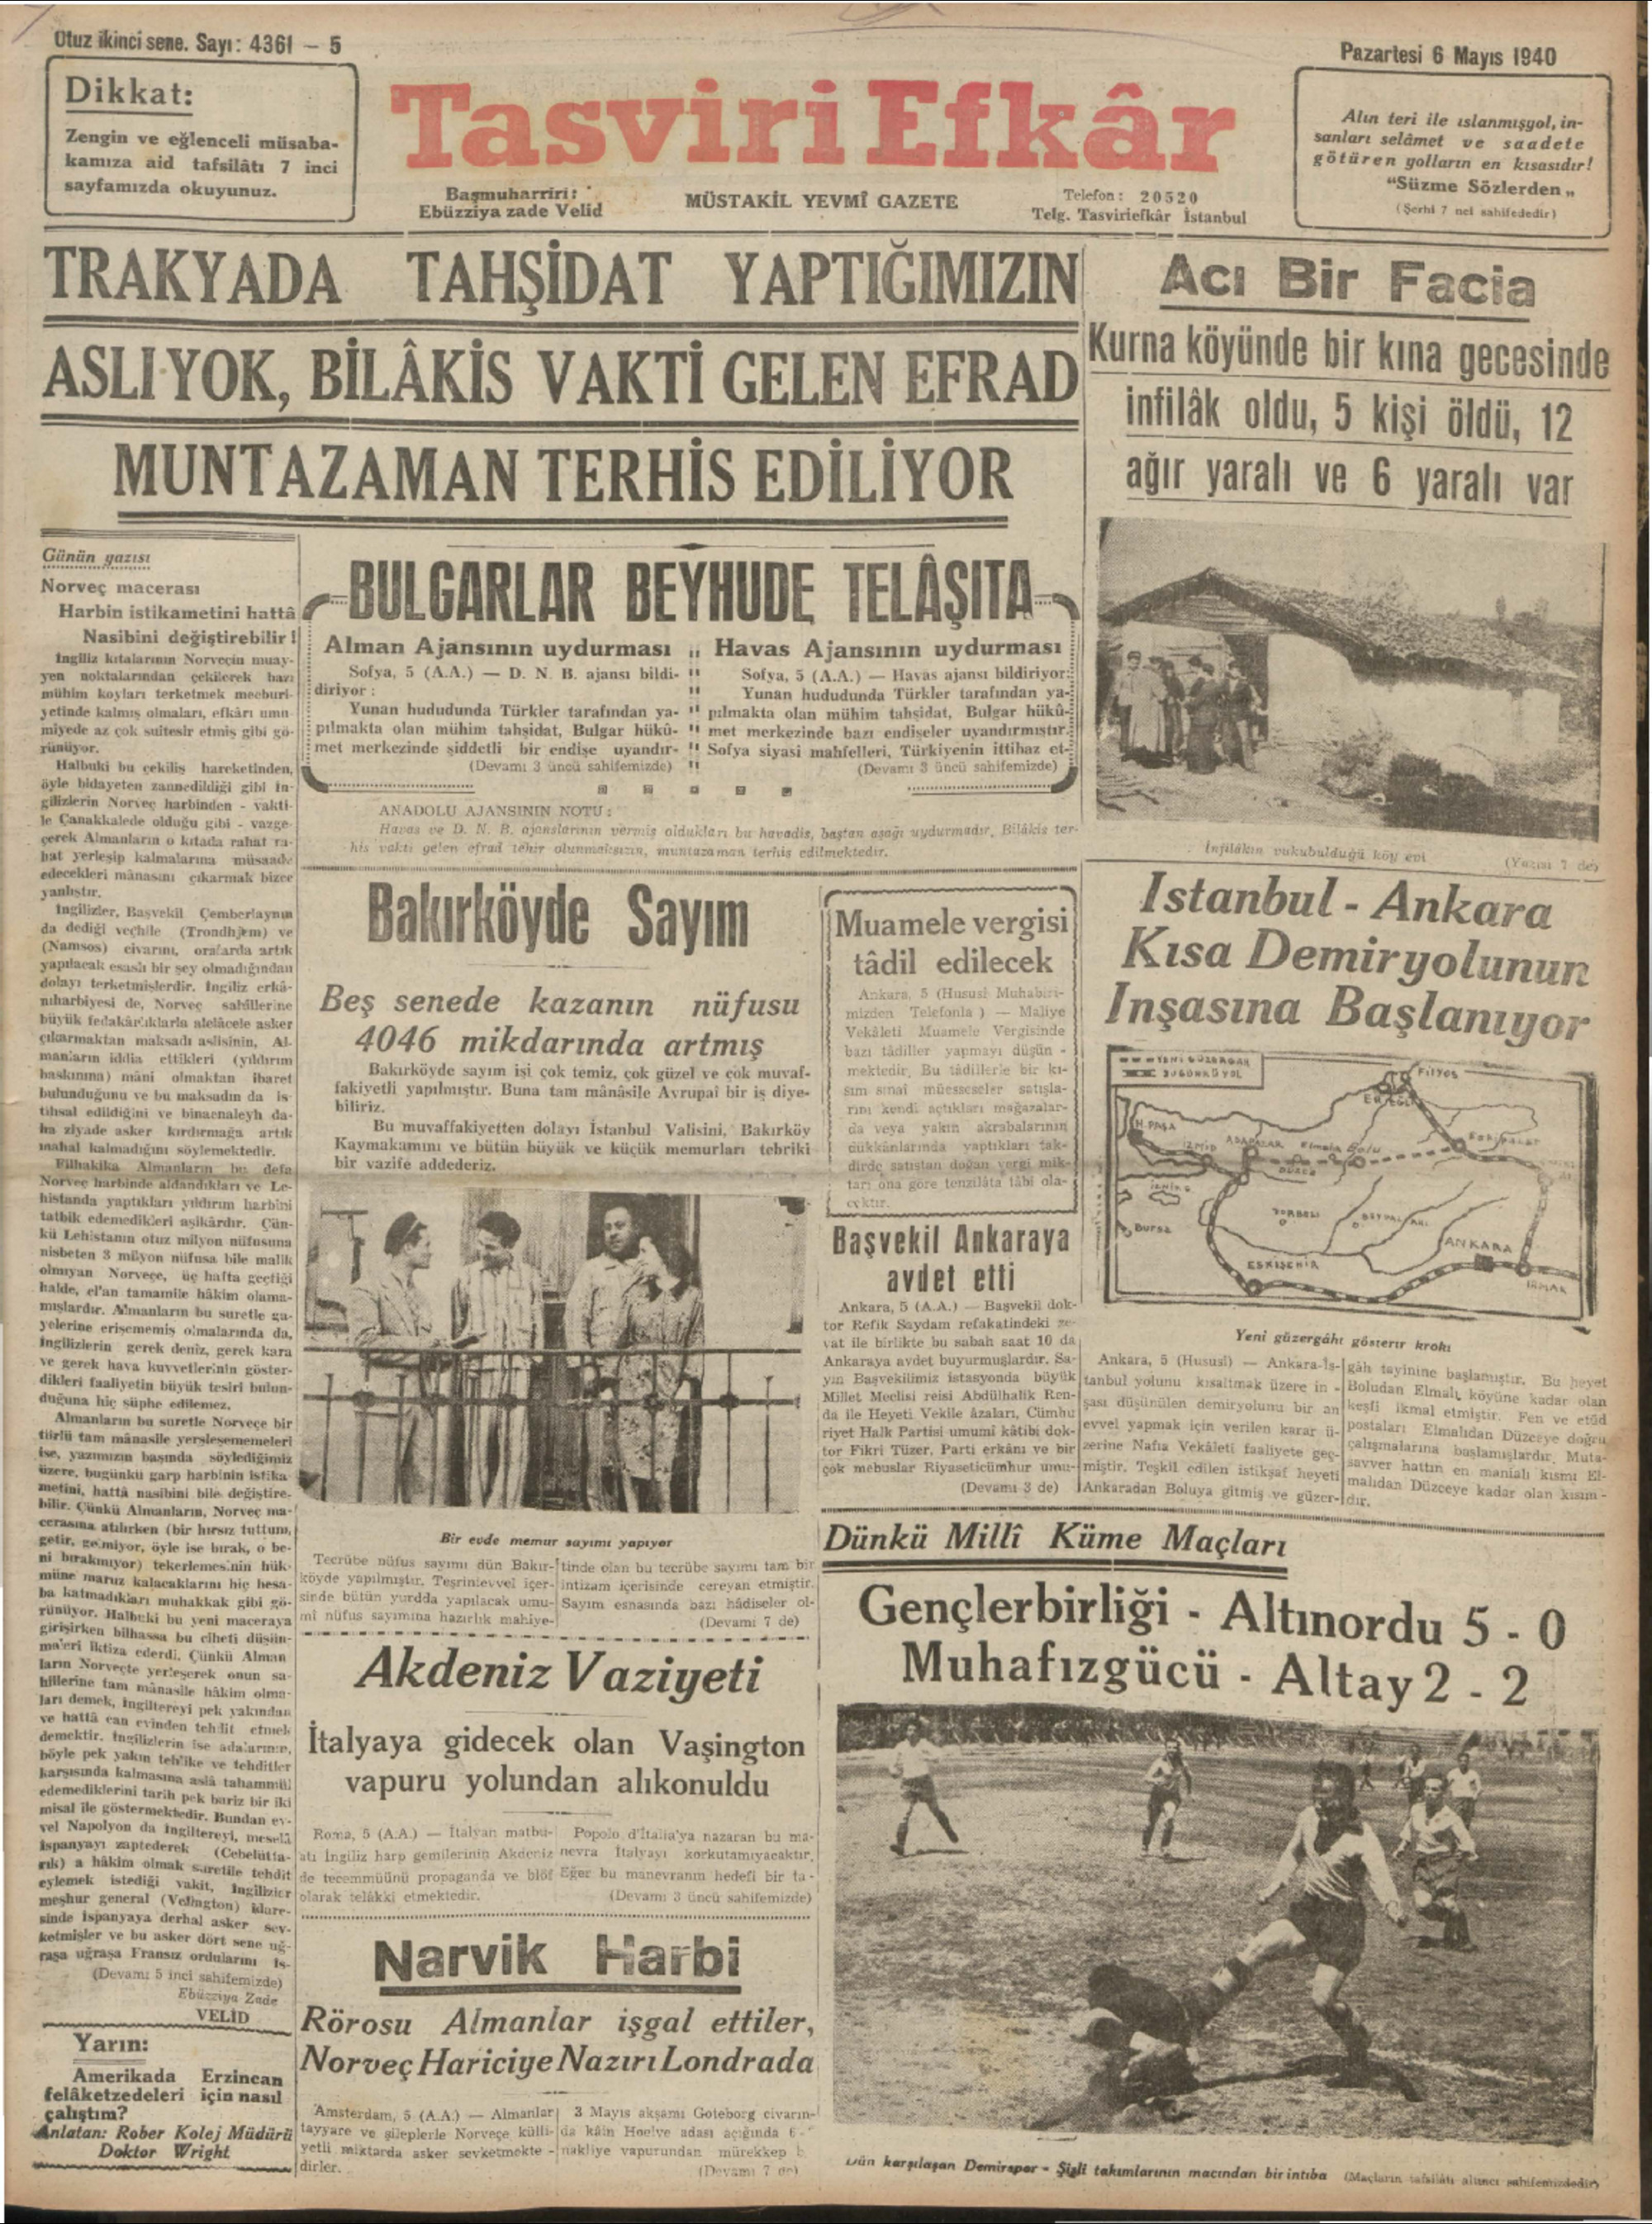 6 Mayıs 1940 Tarihli Tasviri Efkar Gazetesi Sayfa 1